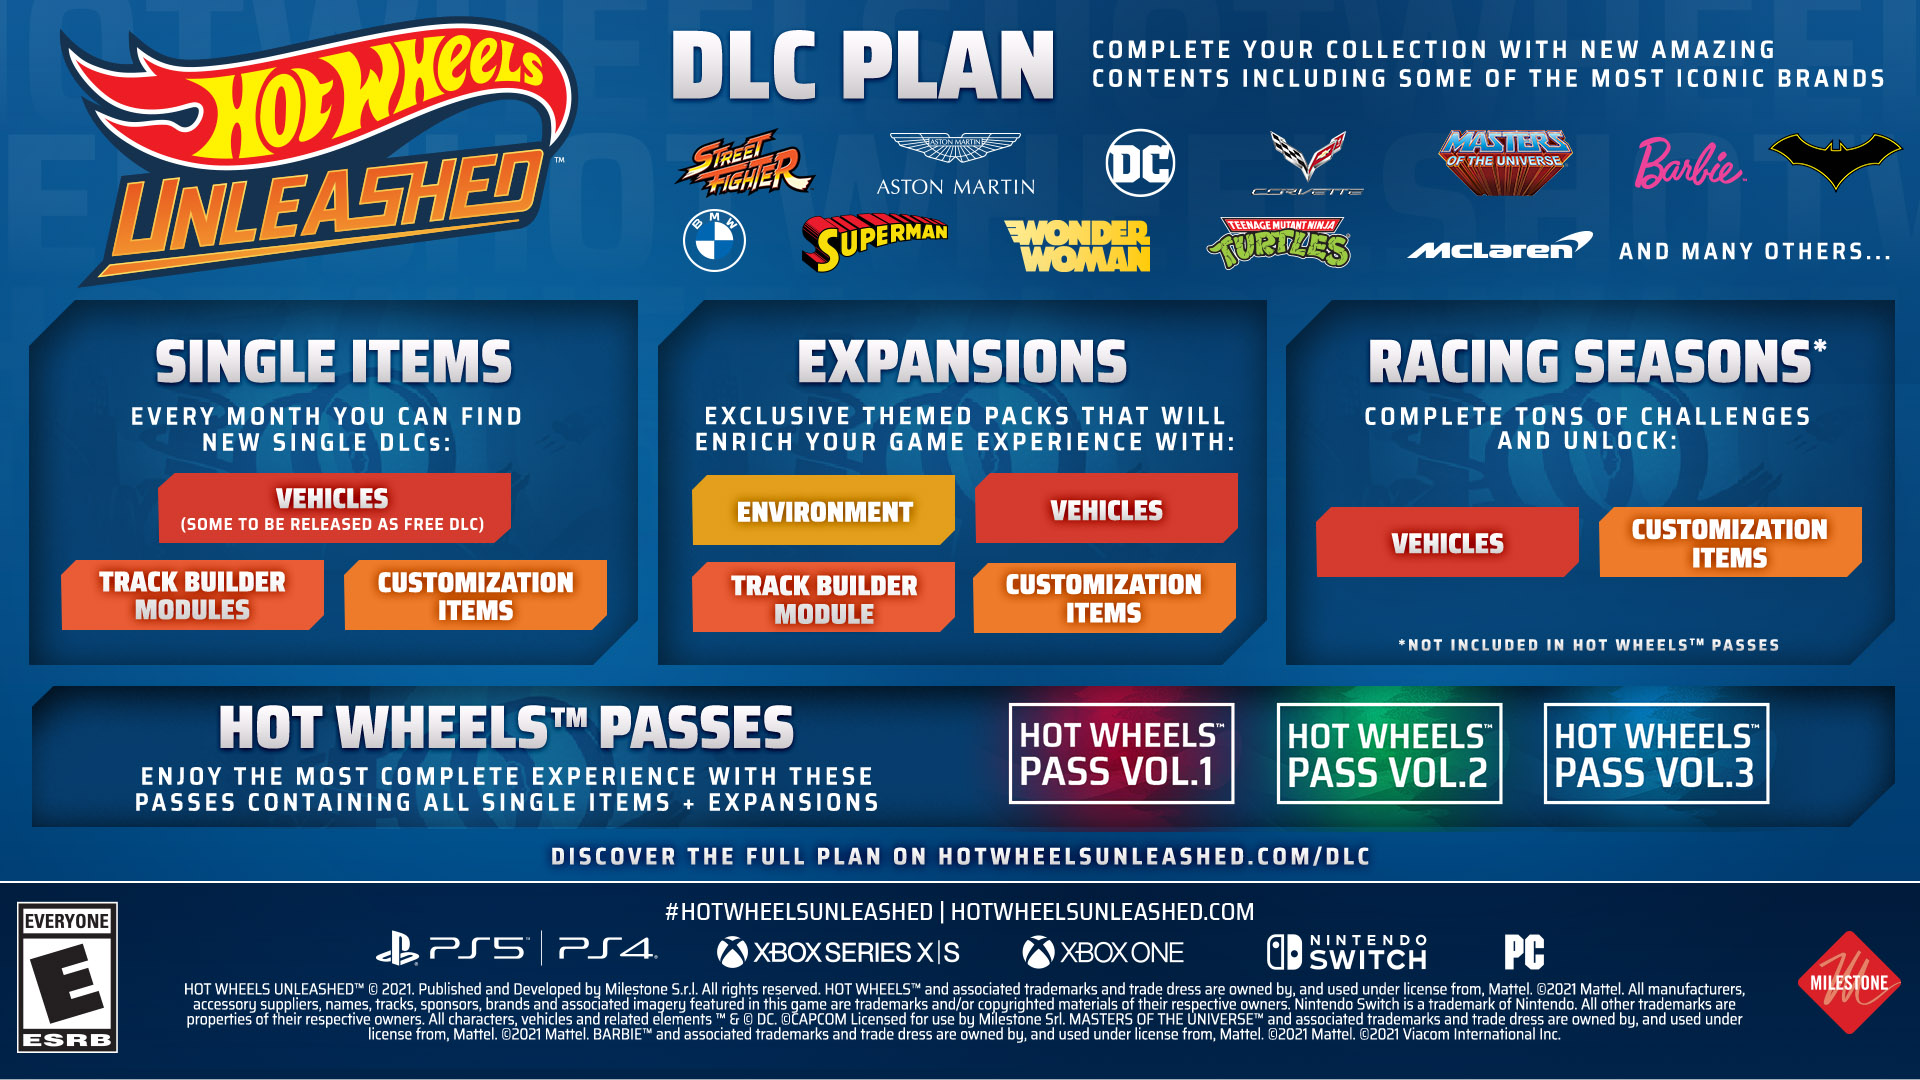 Hot Wheels Unleashed - DLC Plan